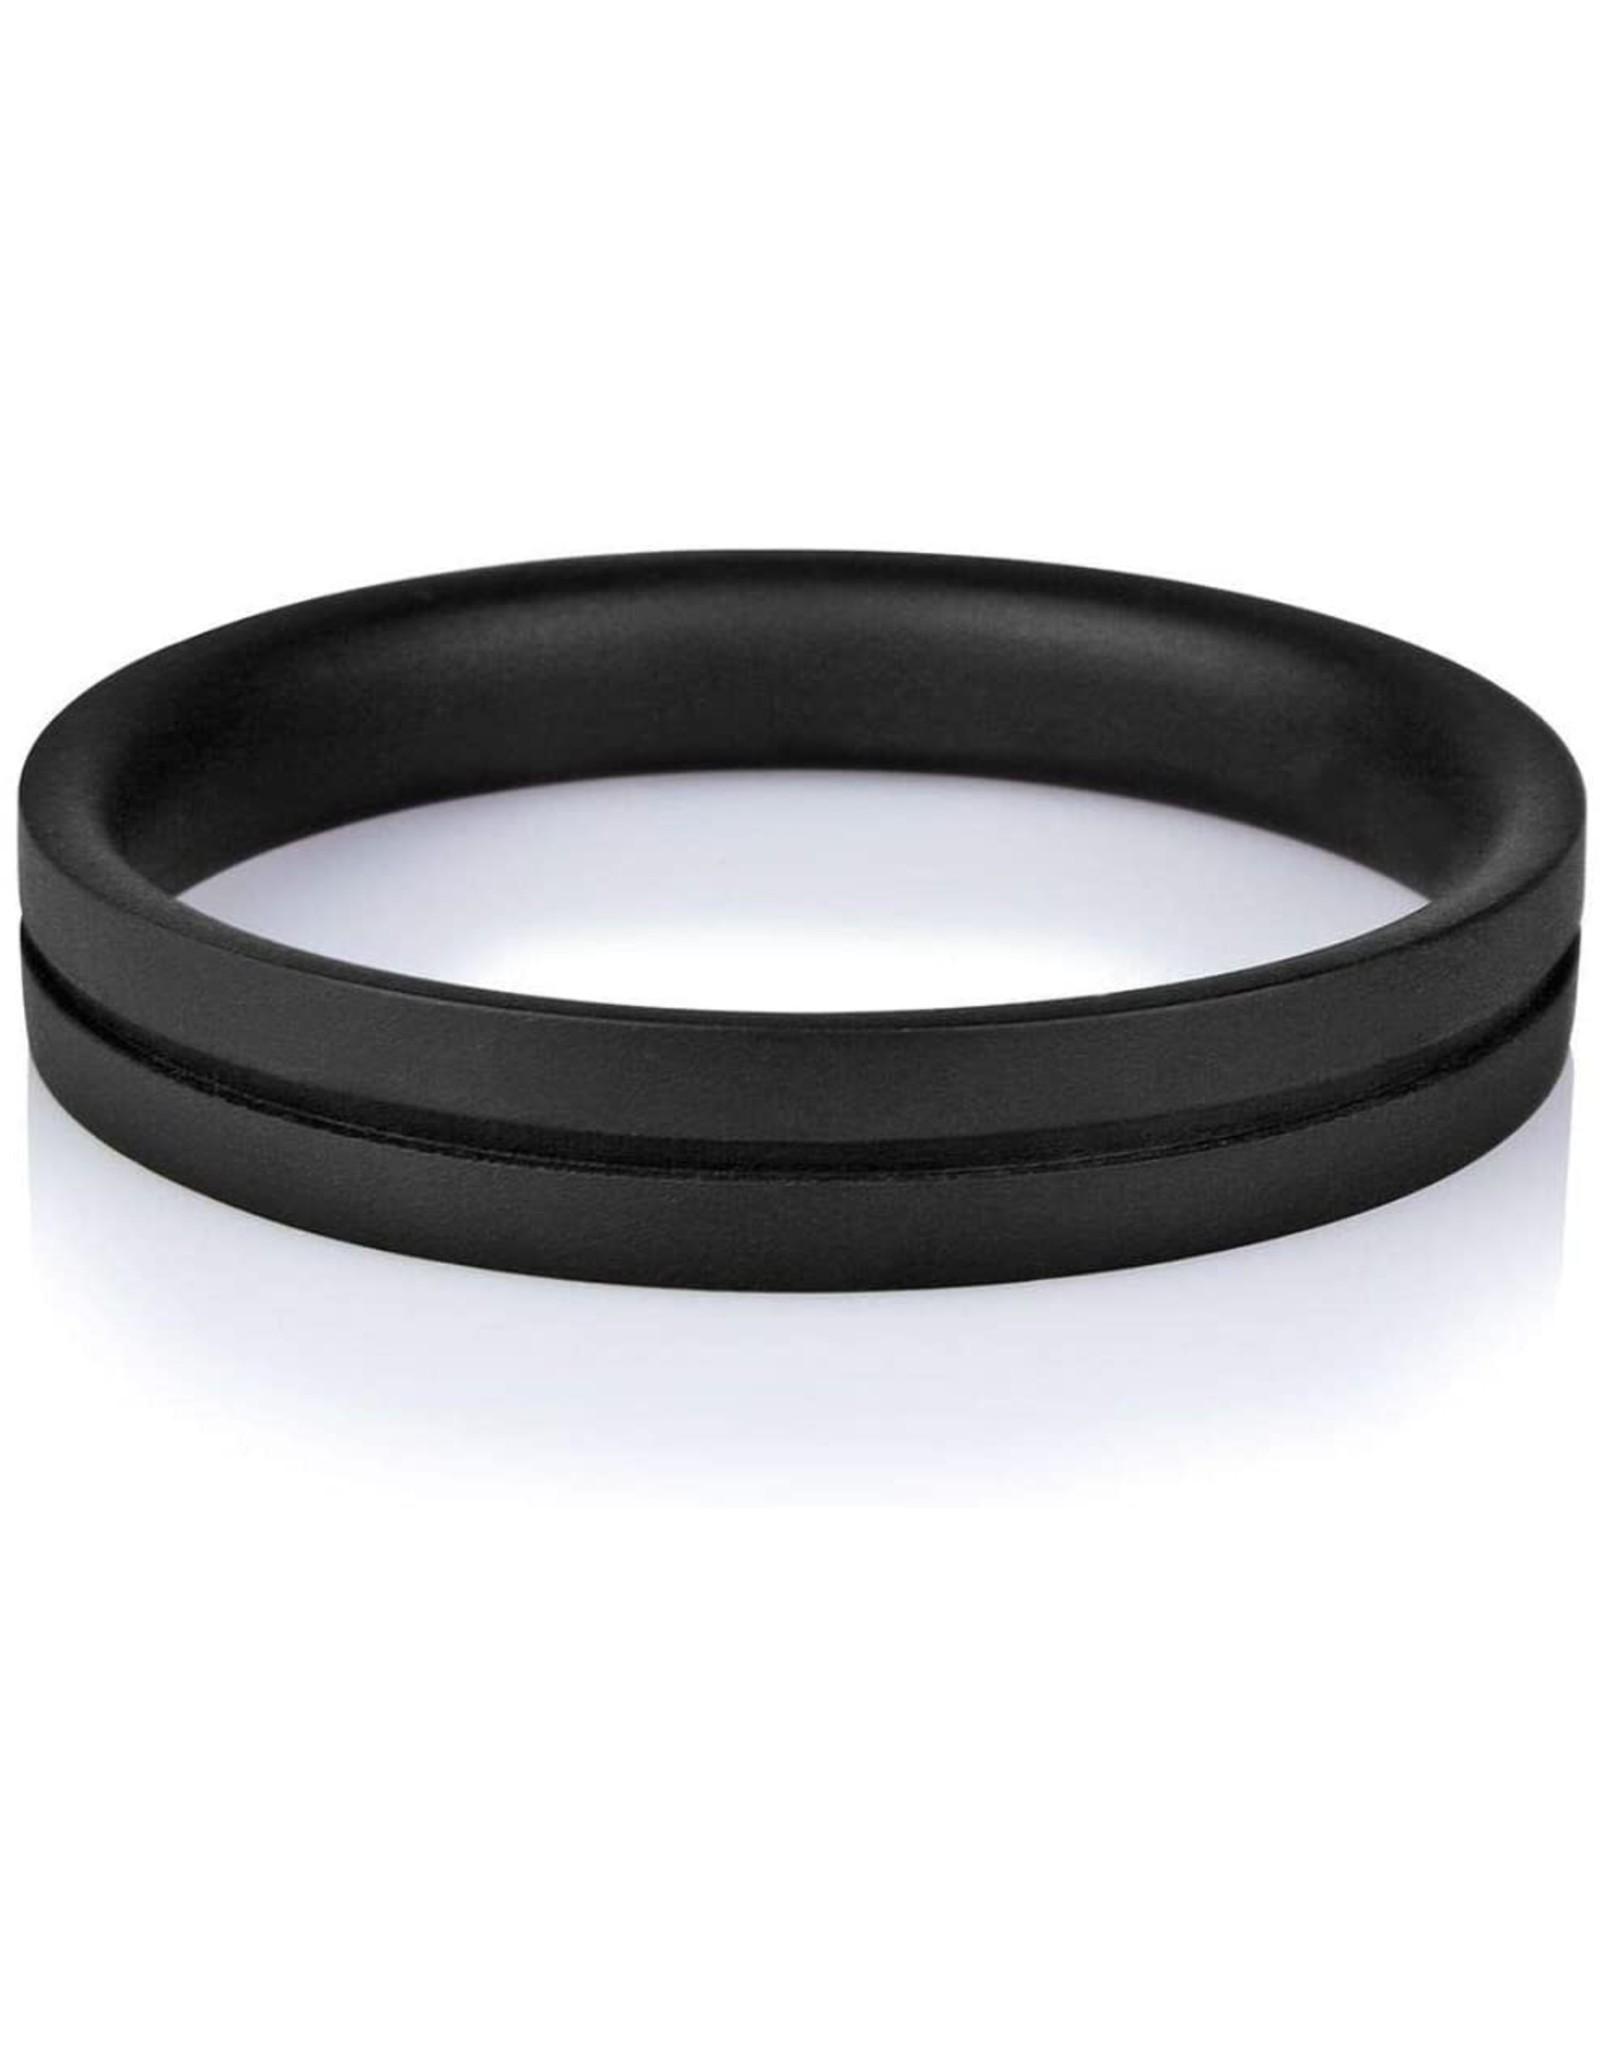 SCREAMING'O - RING'O PRO XXL COCK RING - BLACK